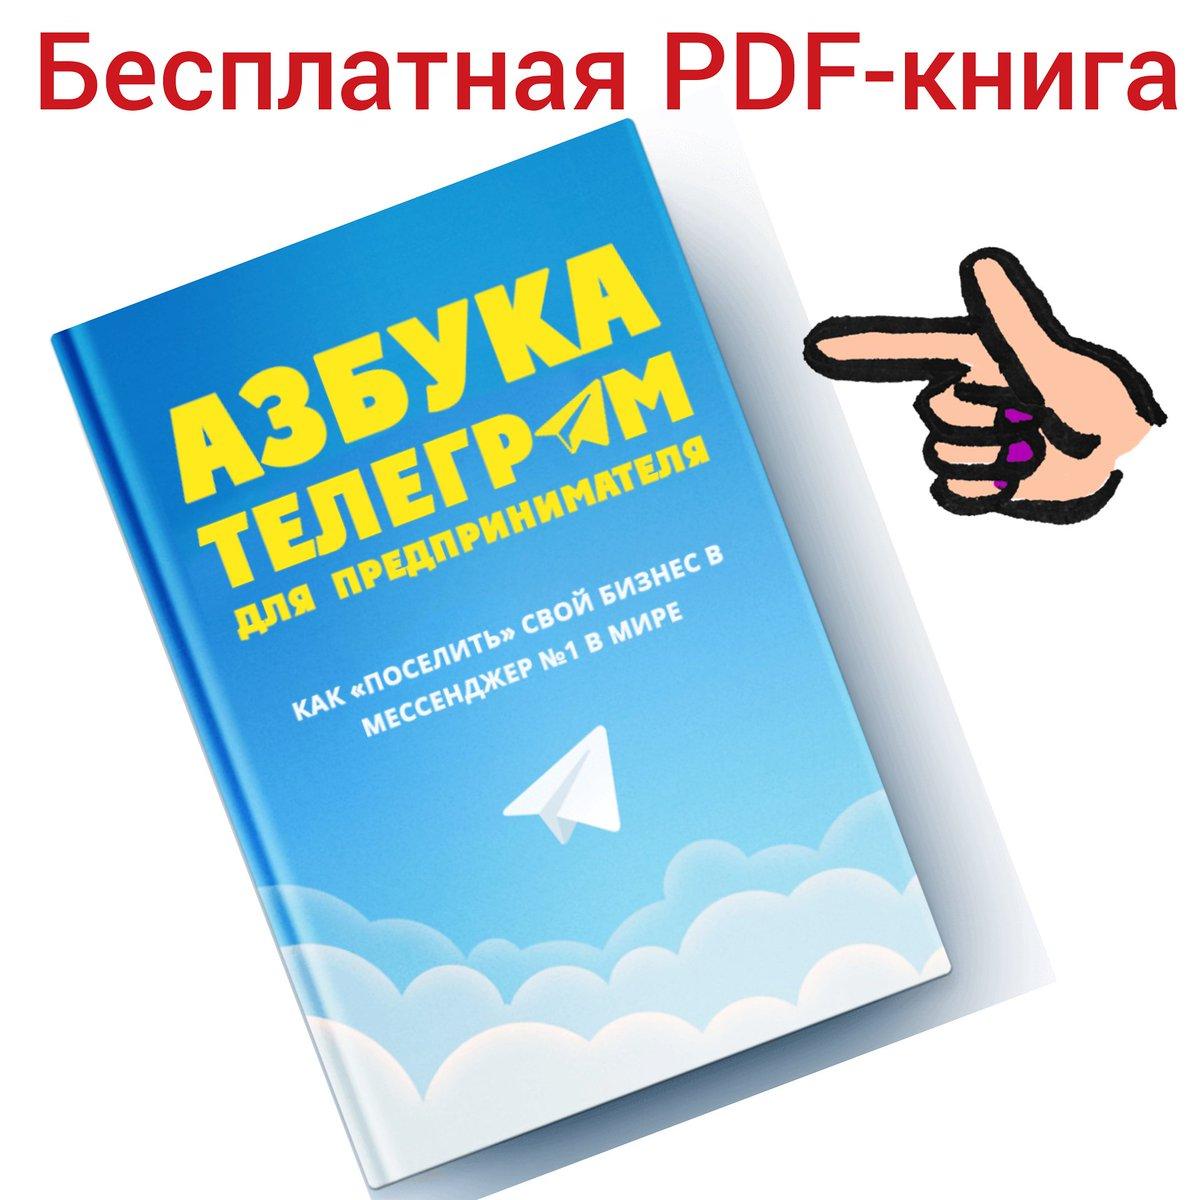 атлас неттера  бесплатно pdf